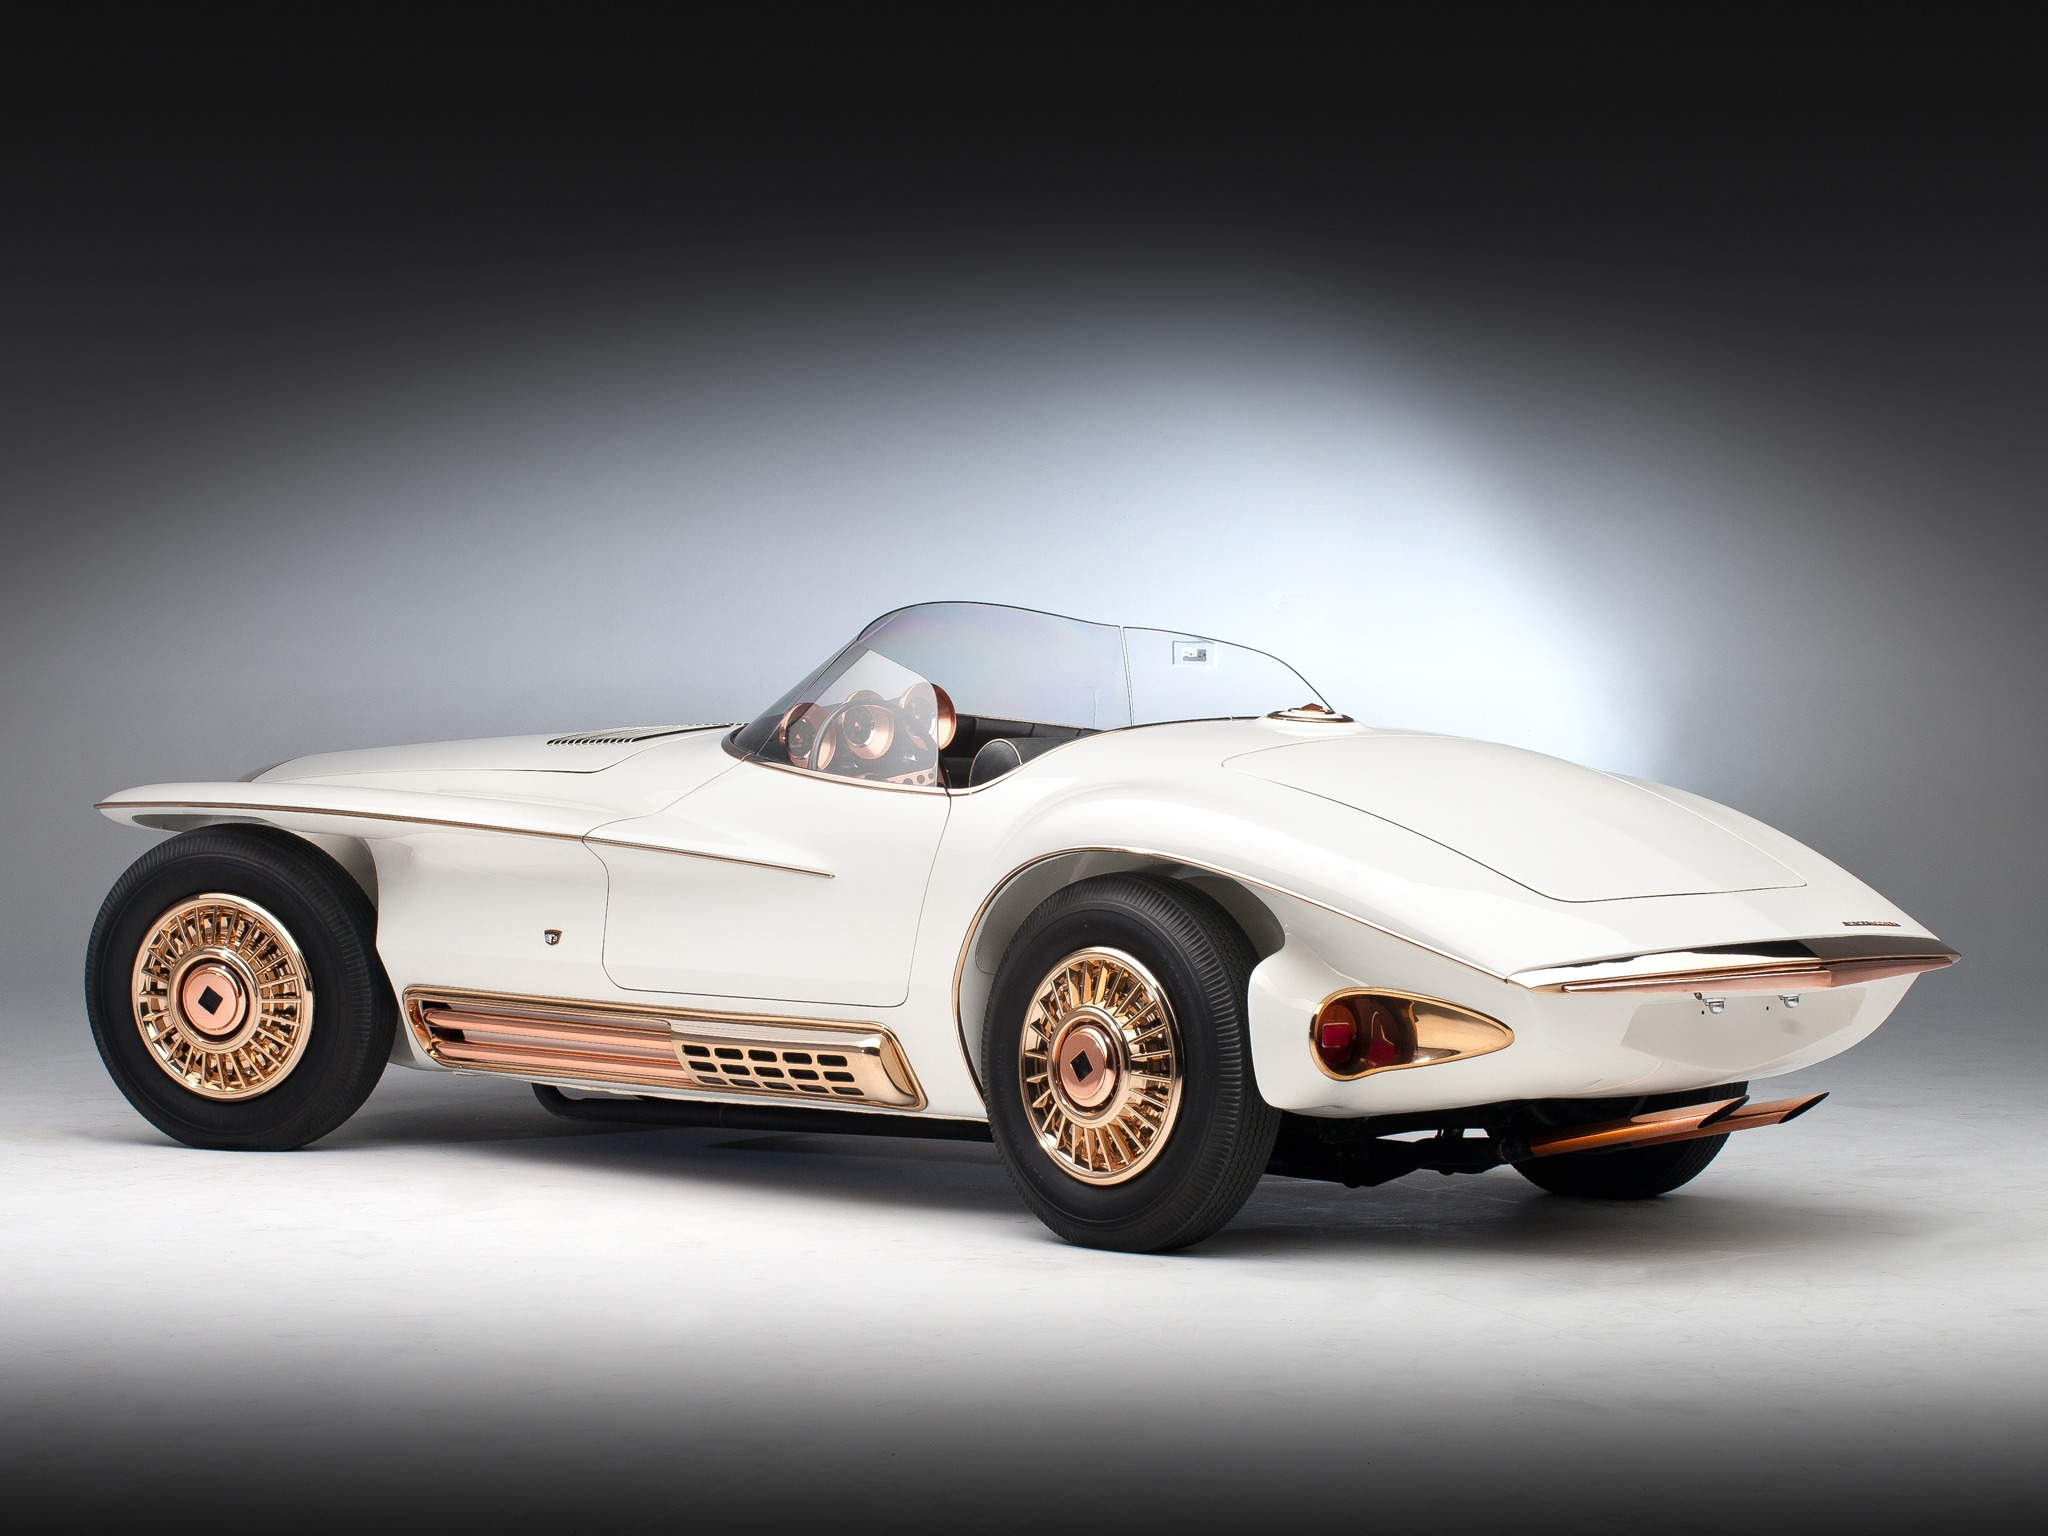 1965_Mercer_Cobra_Roadster_by_Virgil_Exner_02